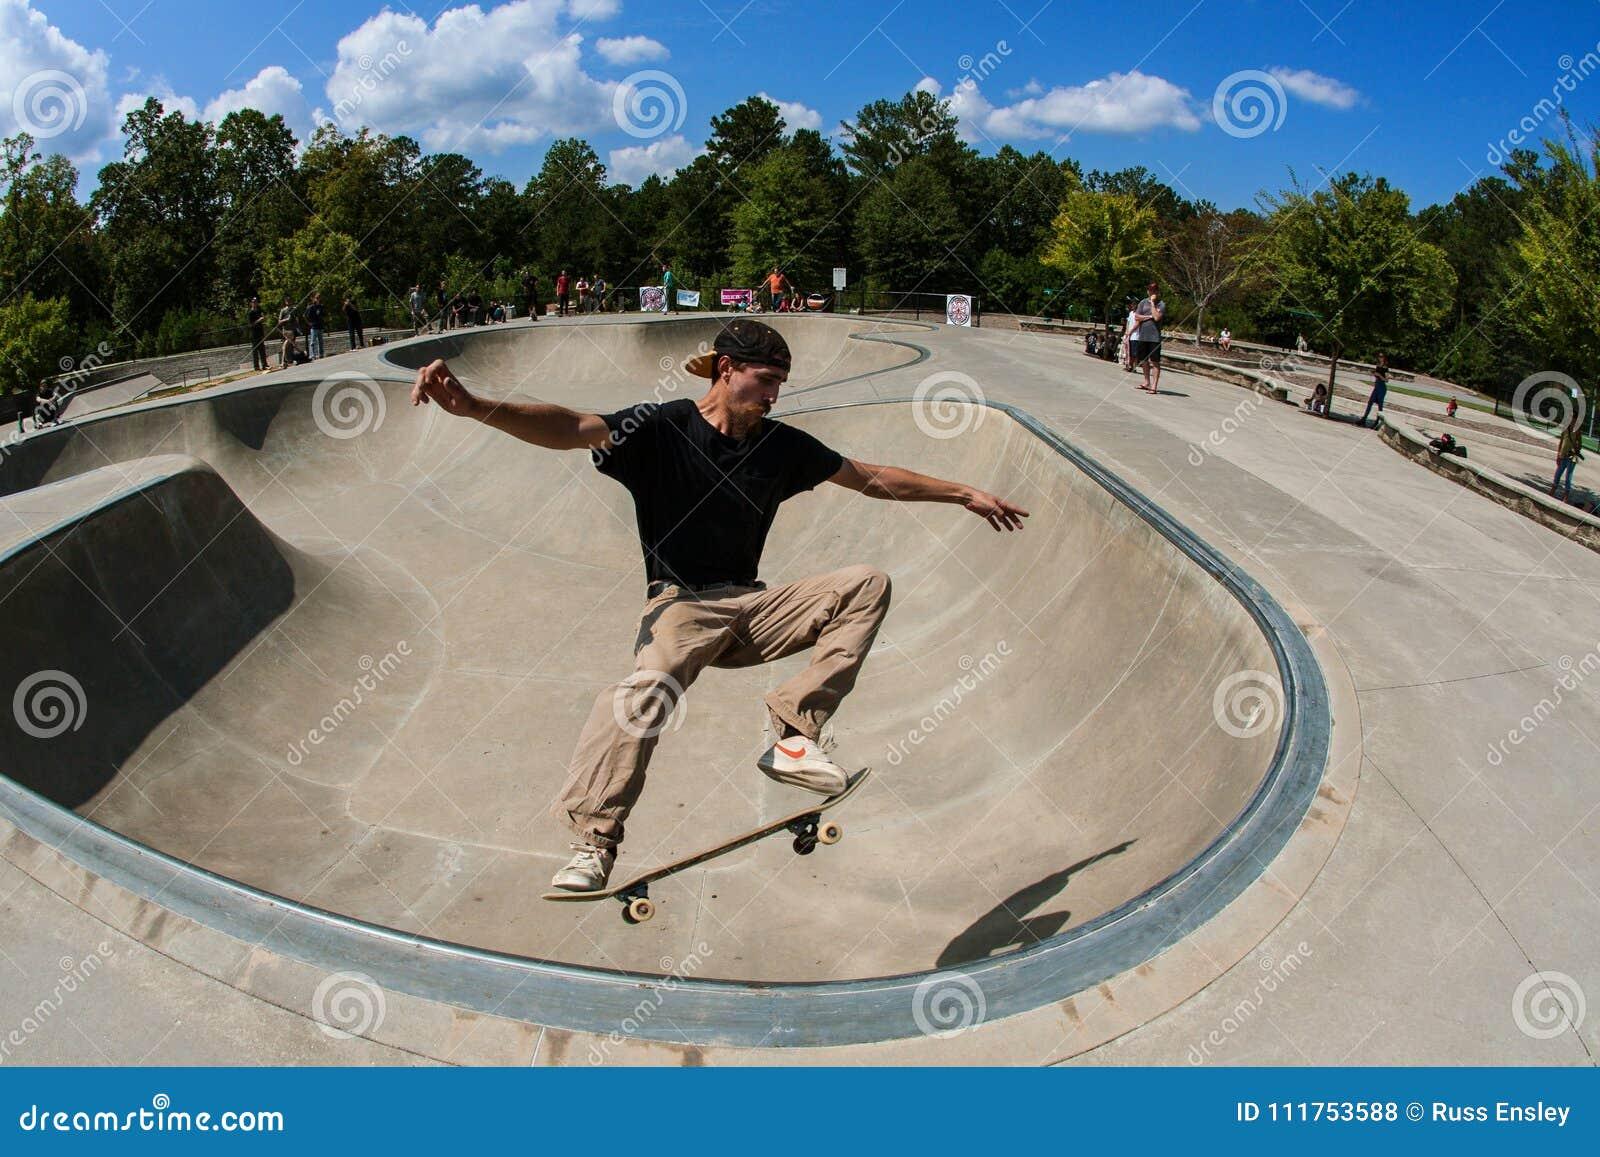 Man Performs Midair Trick In Bowl At Skateboard Park